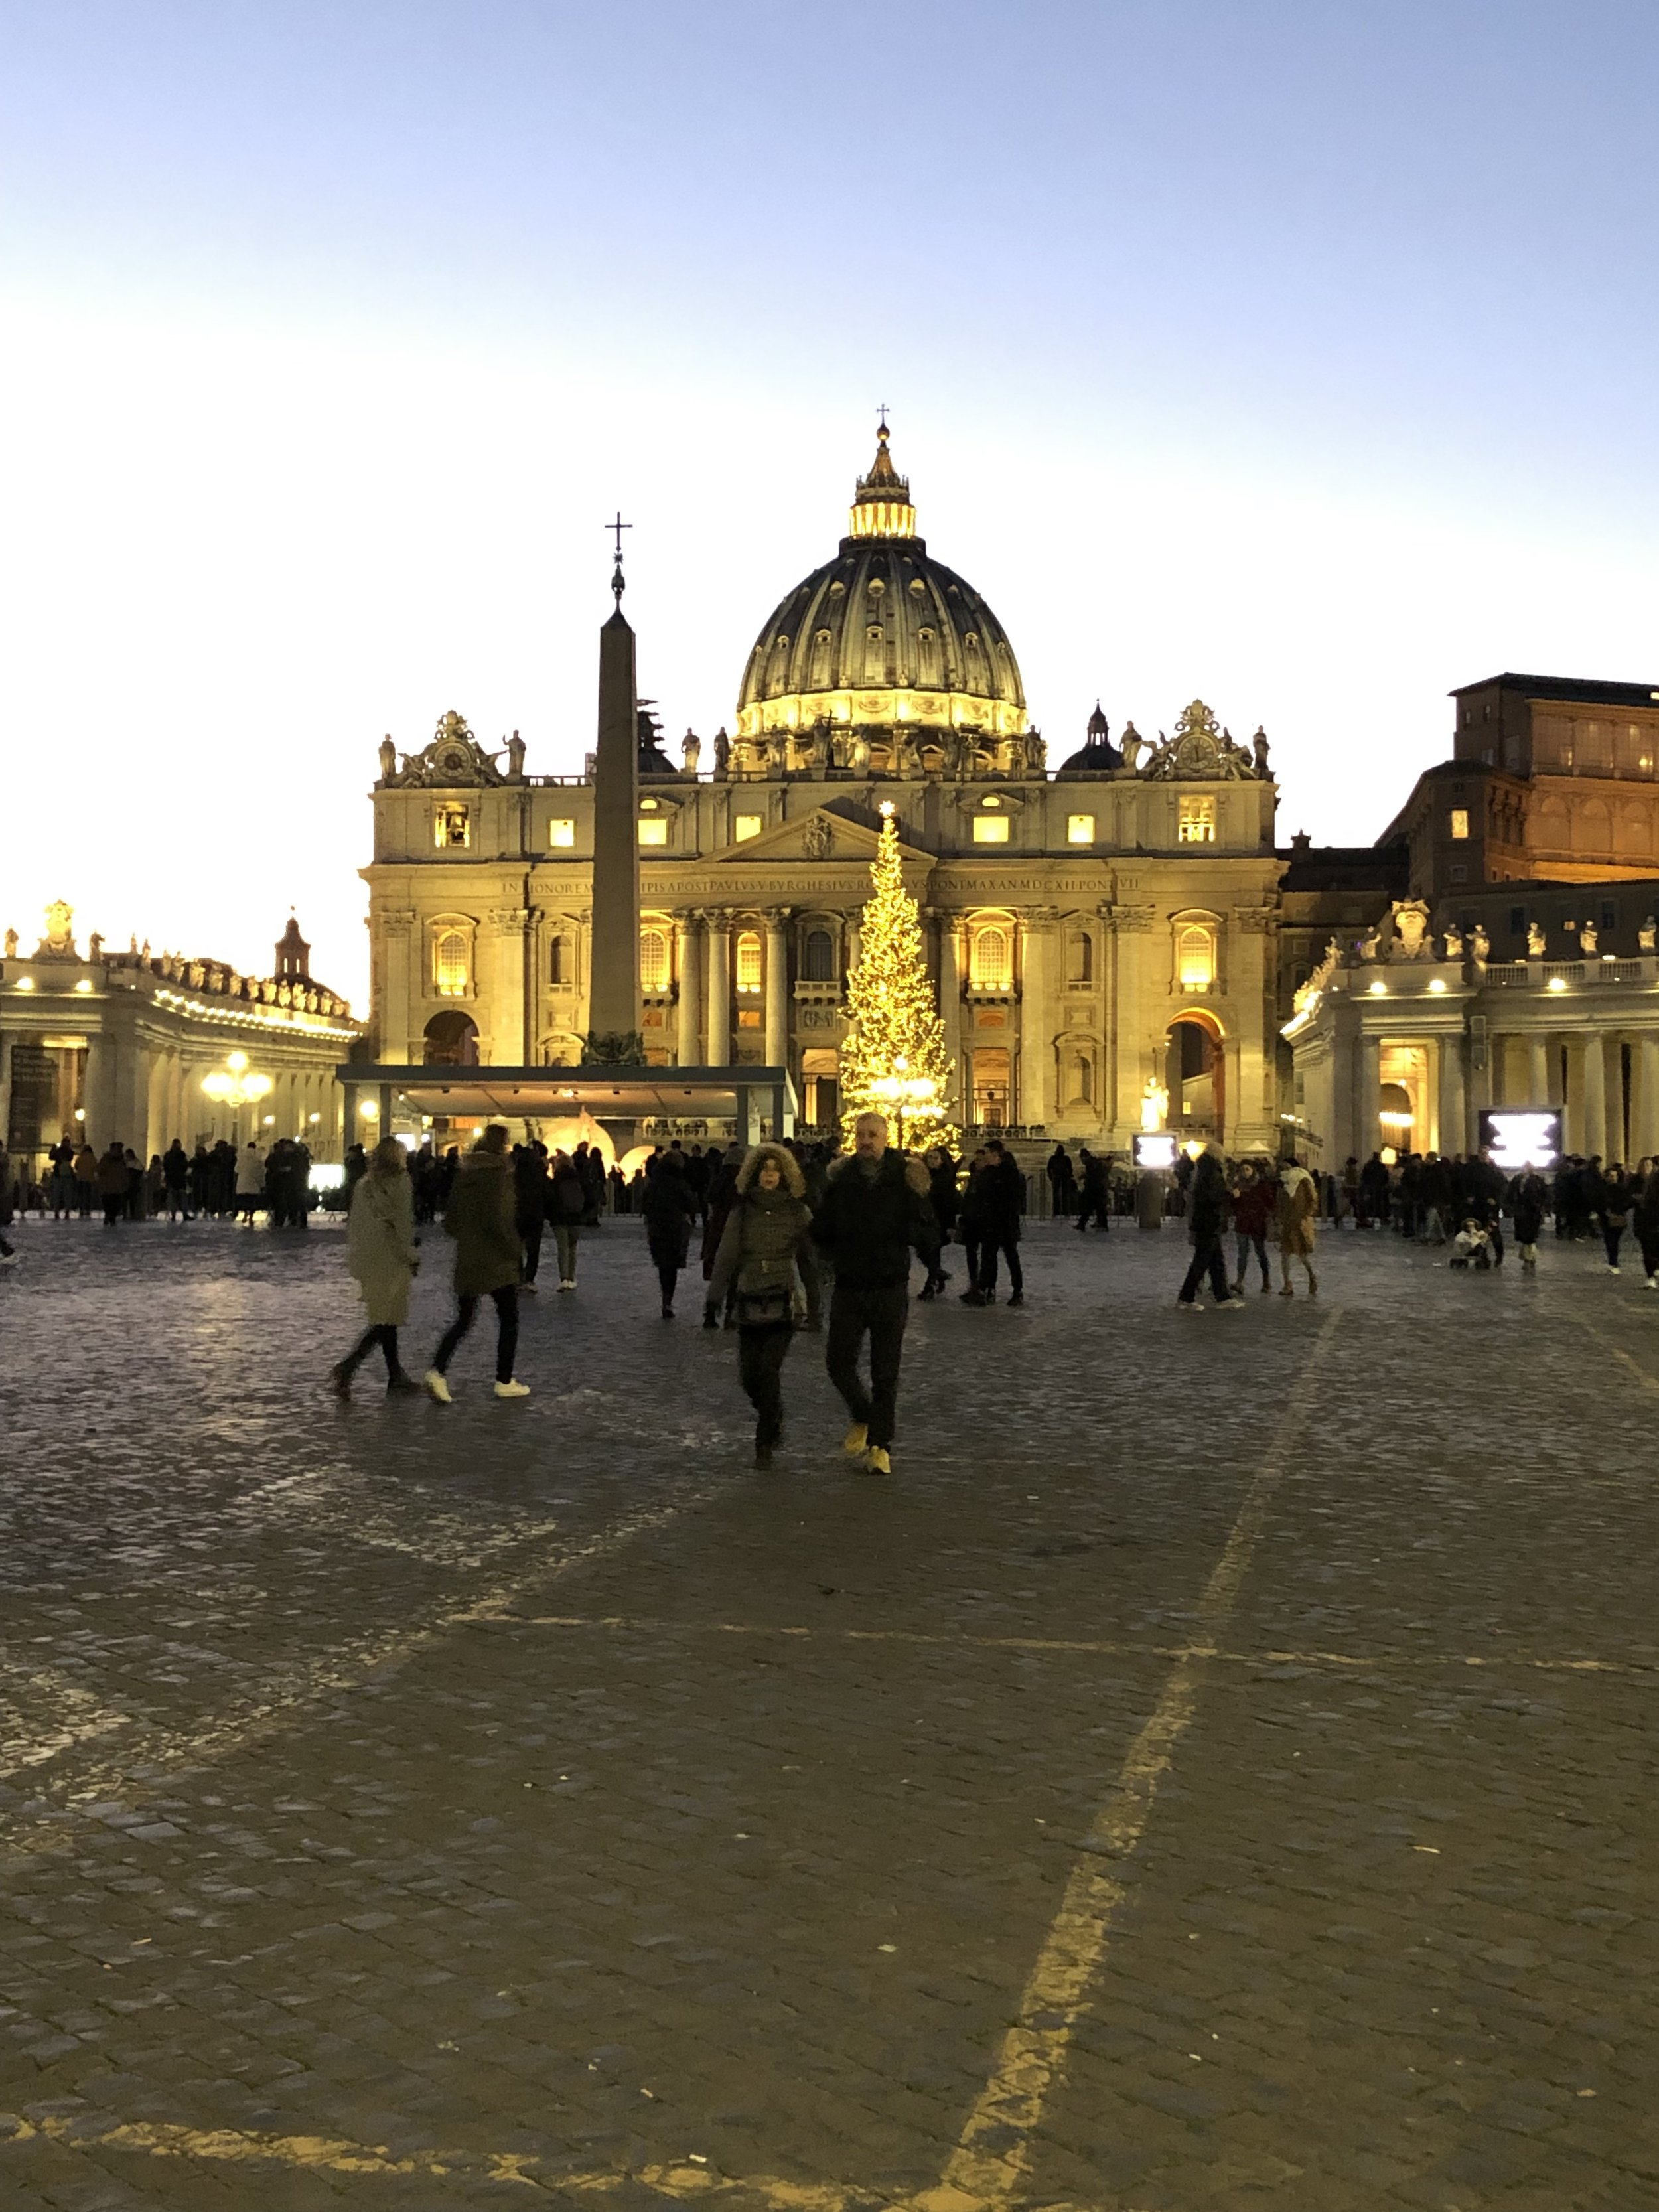 St. Peter's Basilica at twilight.